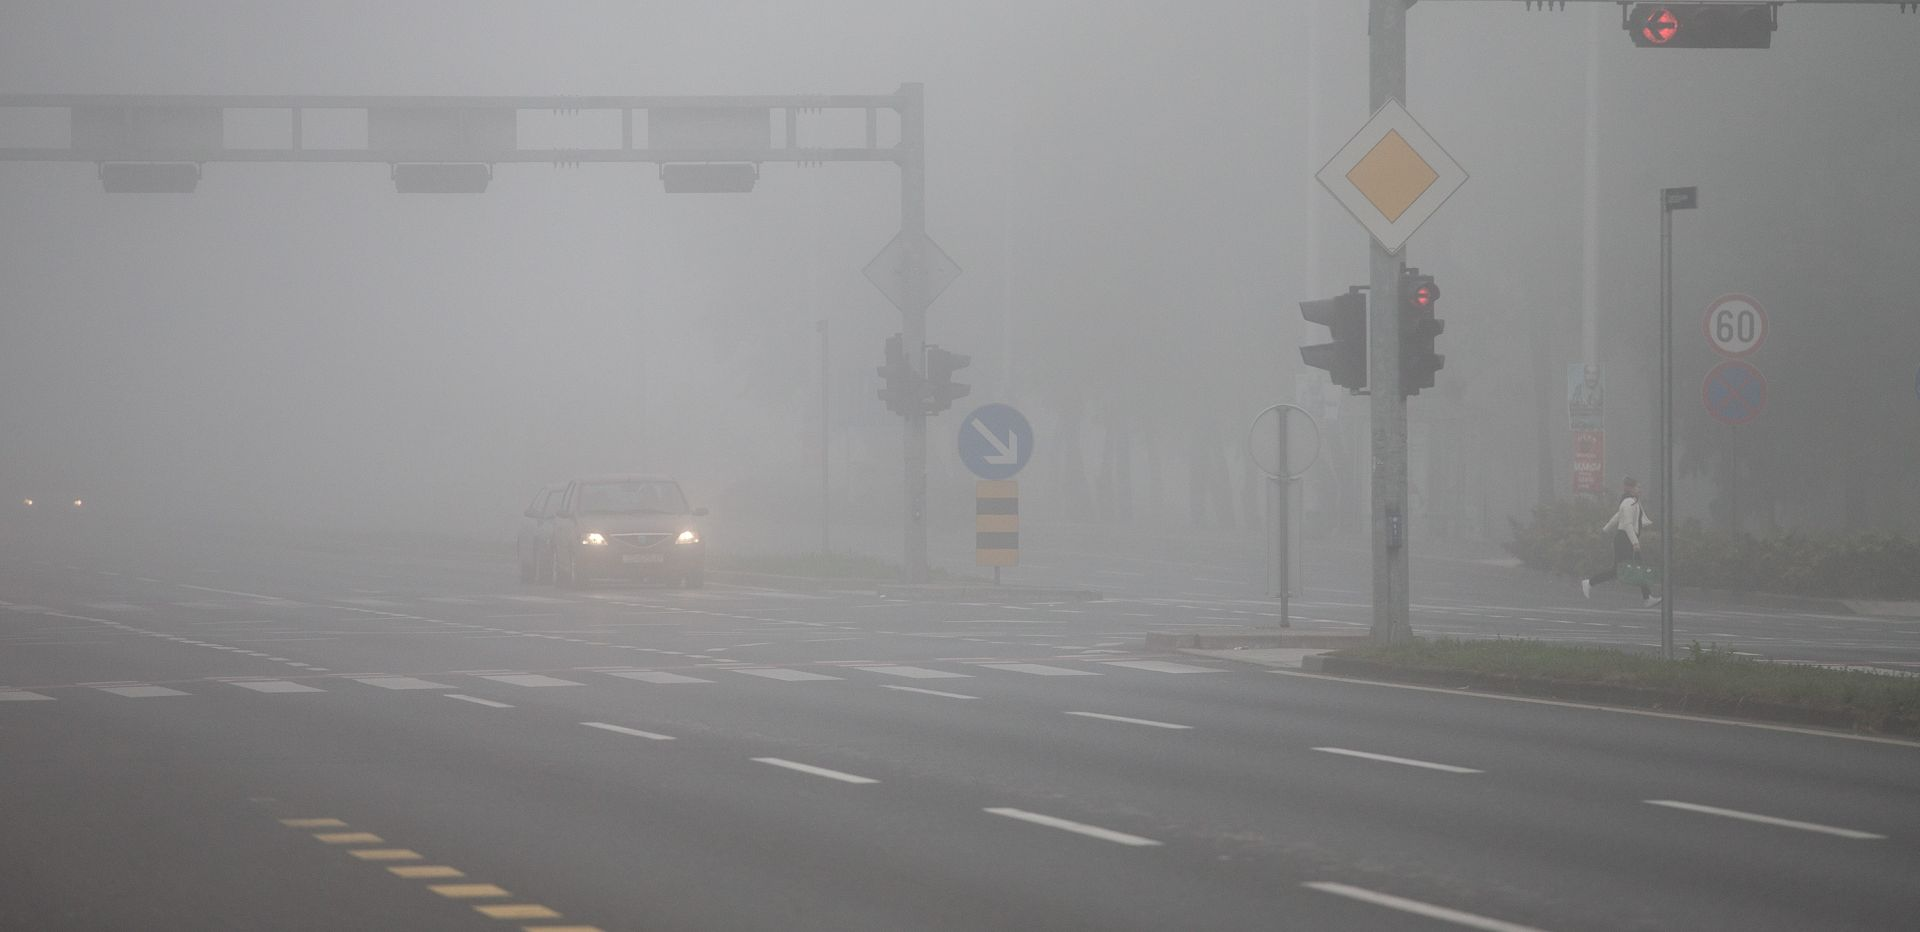 HAK Magla smanjuje vidljivost, na zagrebačkoj obilaznici usporeno zbog opasnosti od naleta divljači